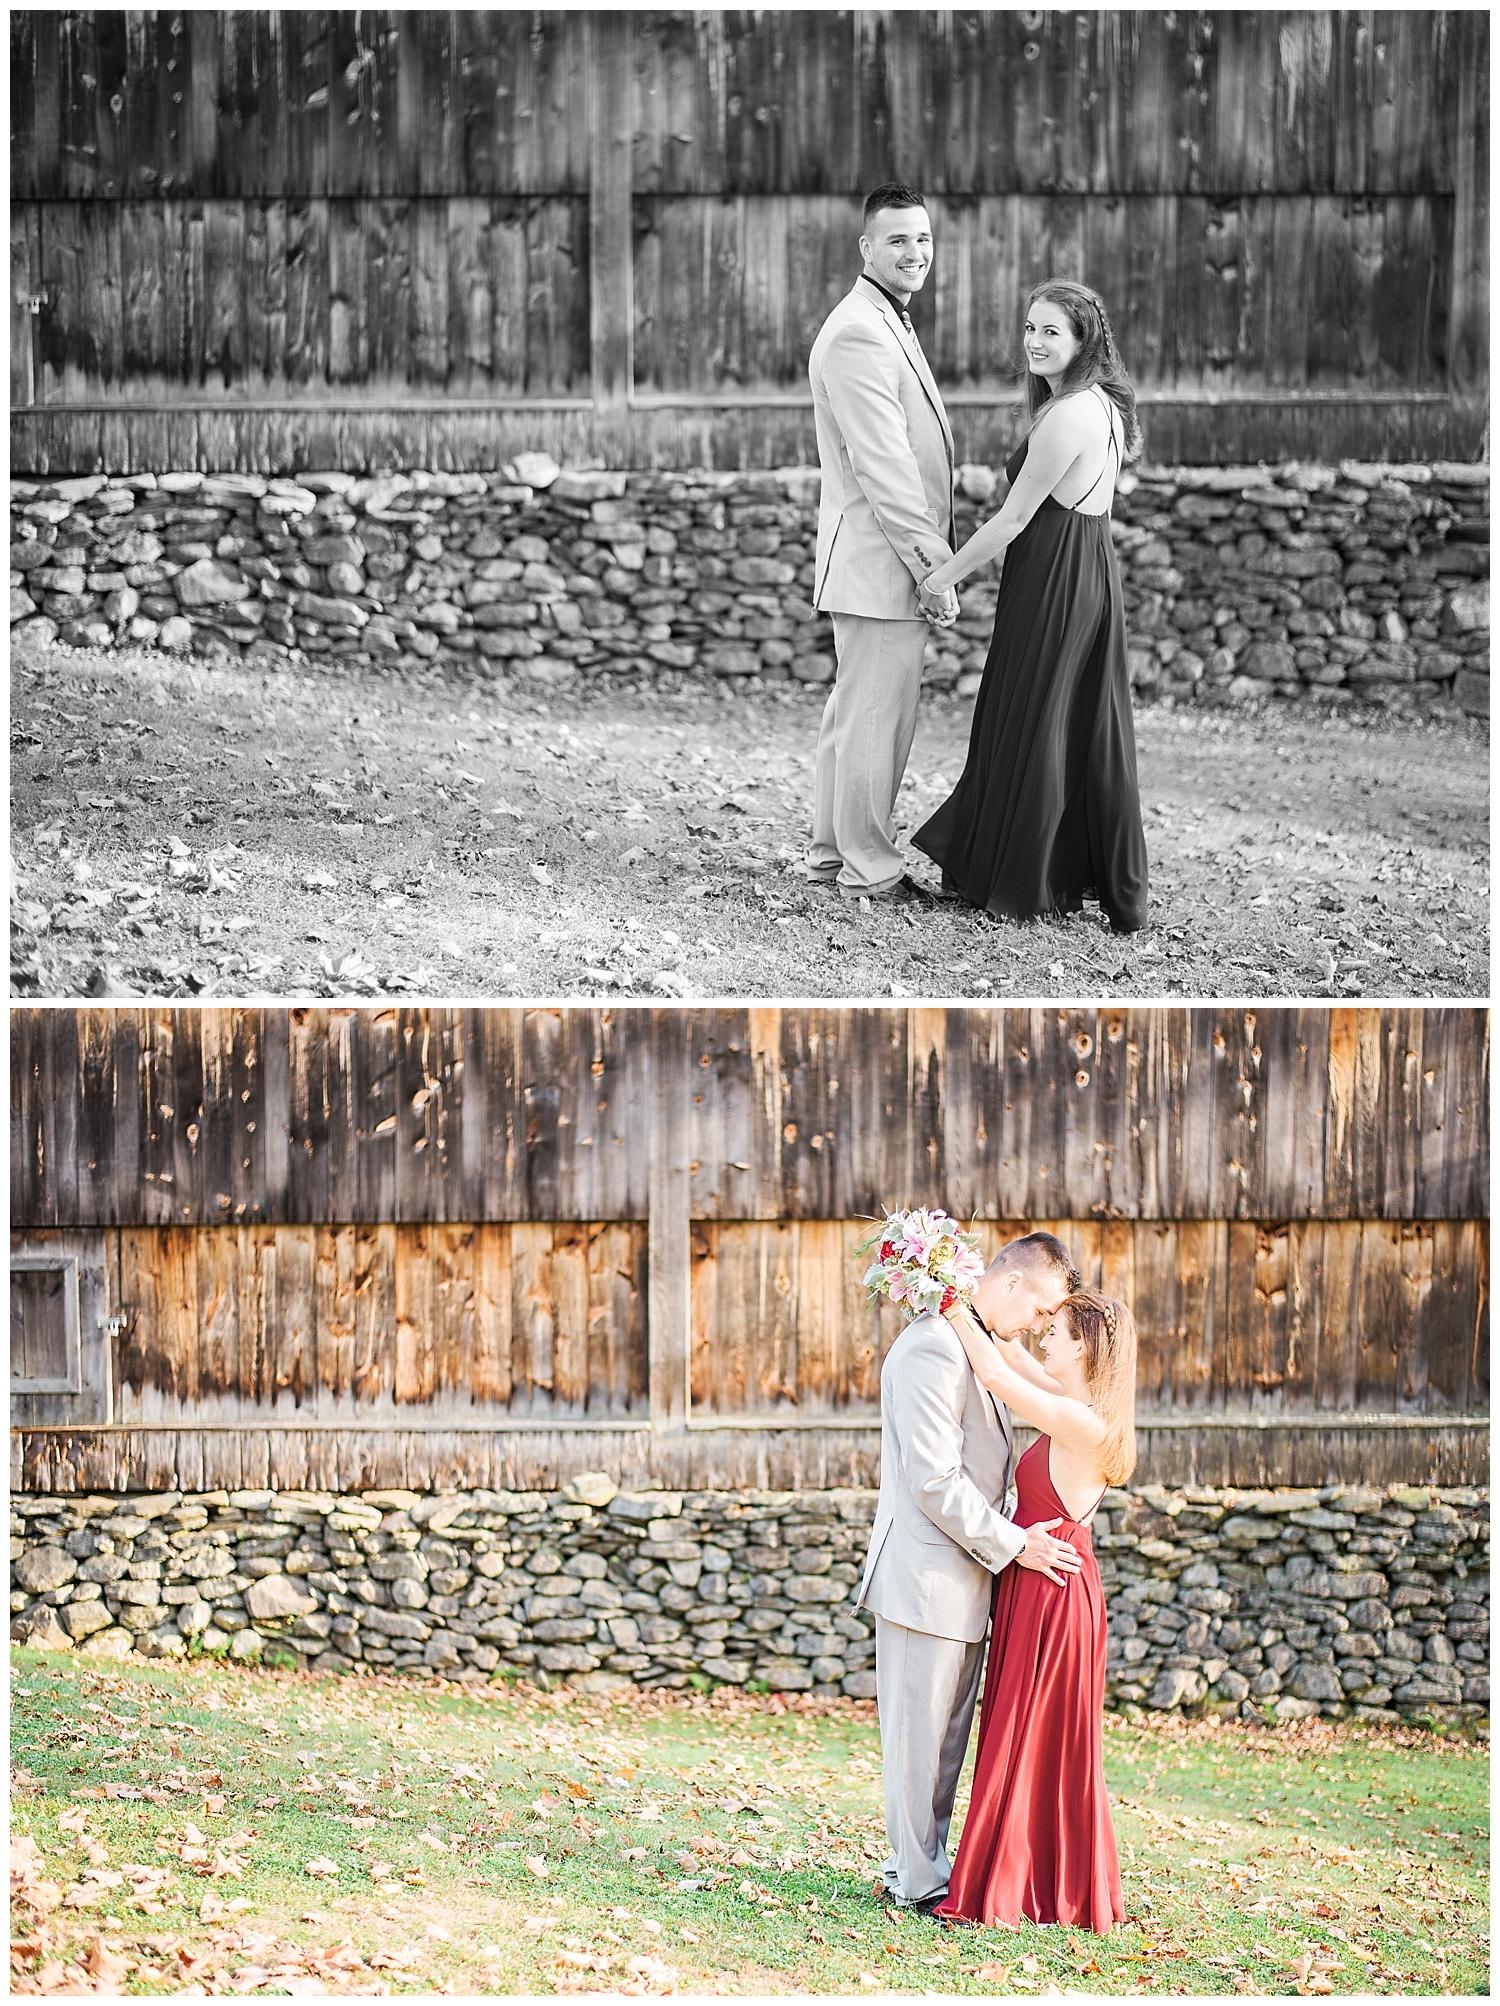 Massachusetts Engagement Photographer